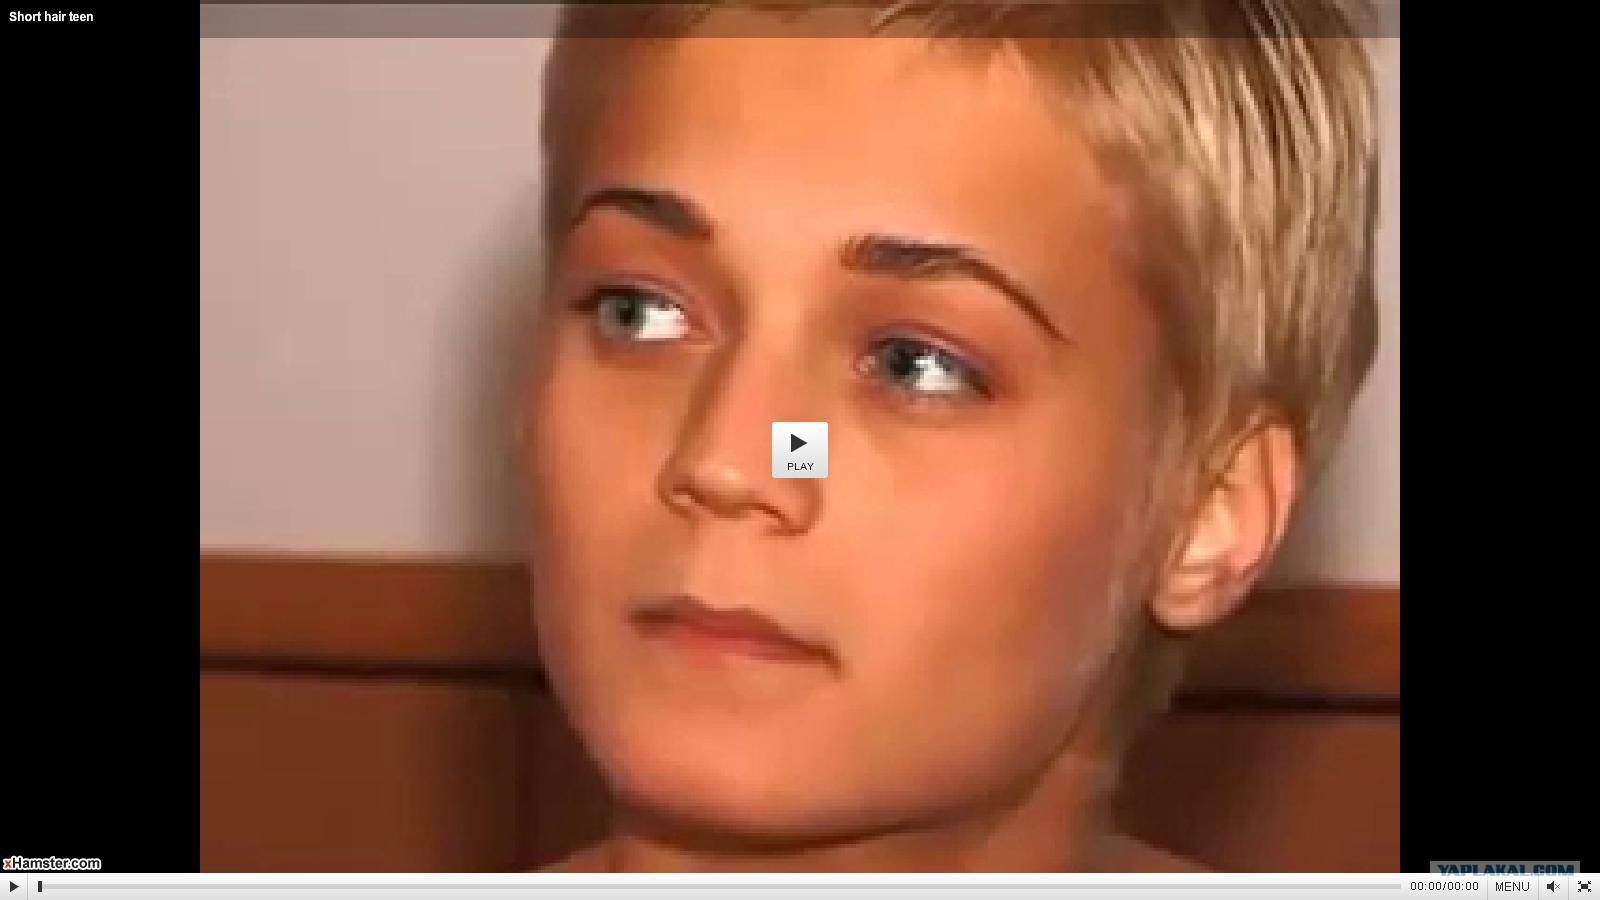 Ммм восьмиклассница  порно фото на ВУКУ